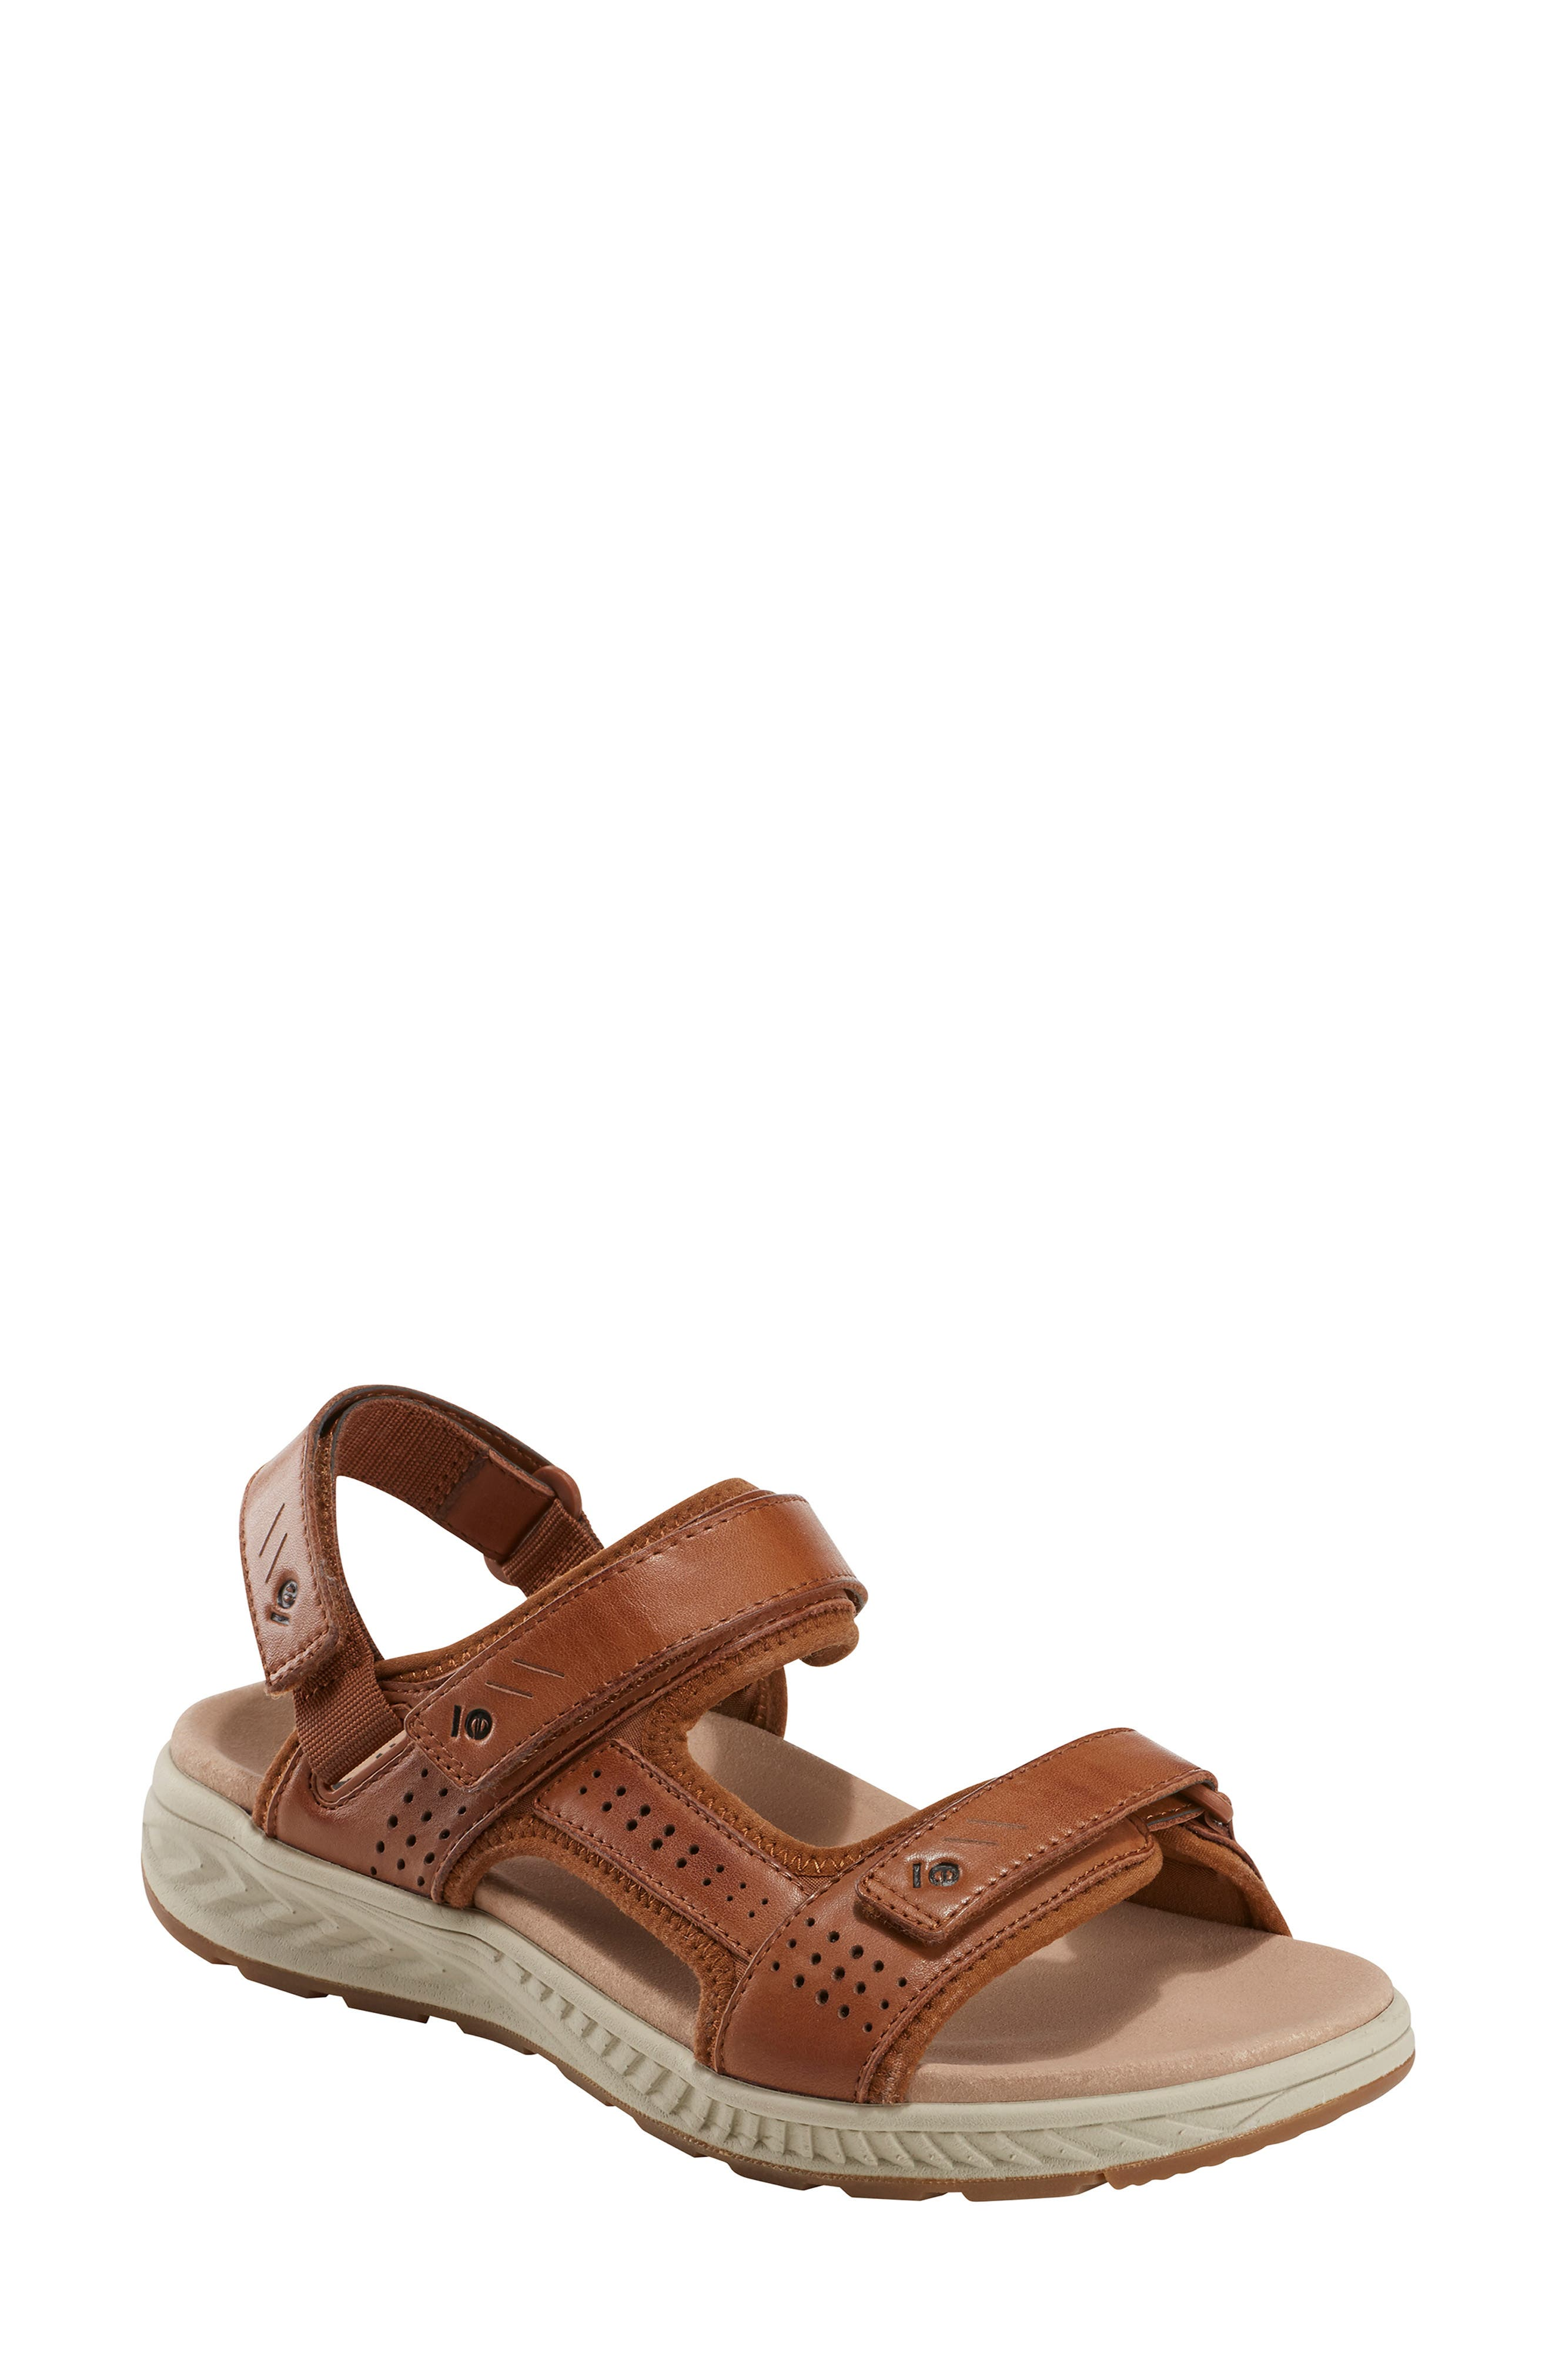 Earth Azore Sandal, Brown